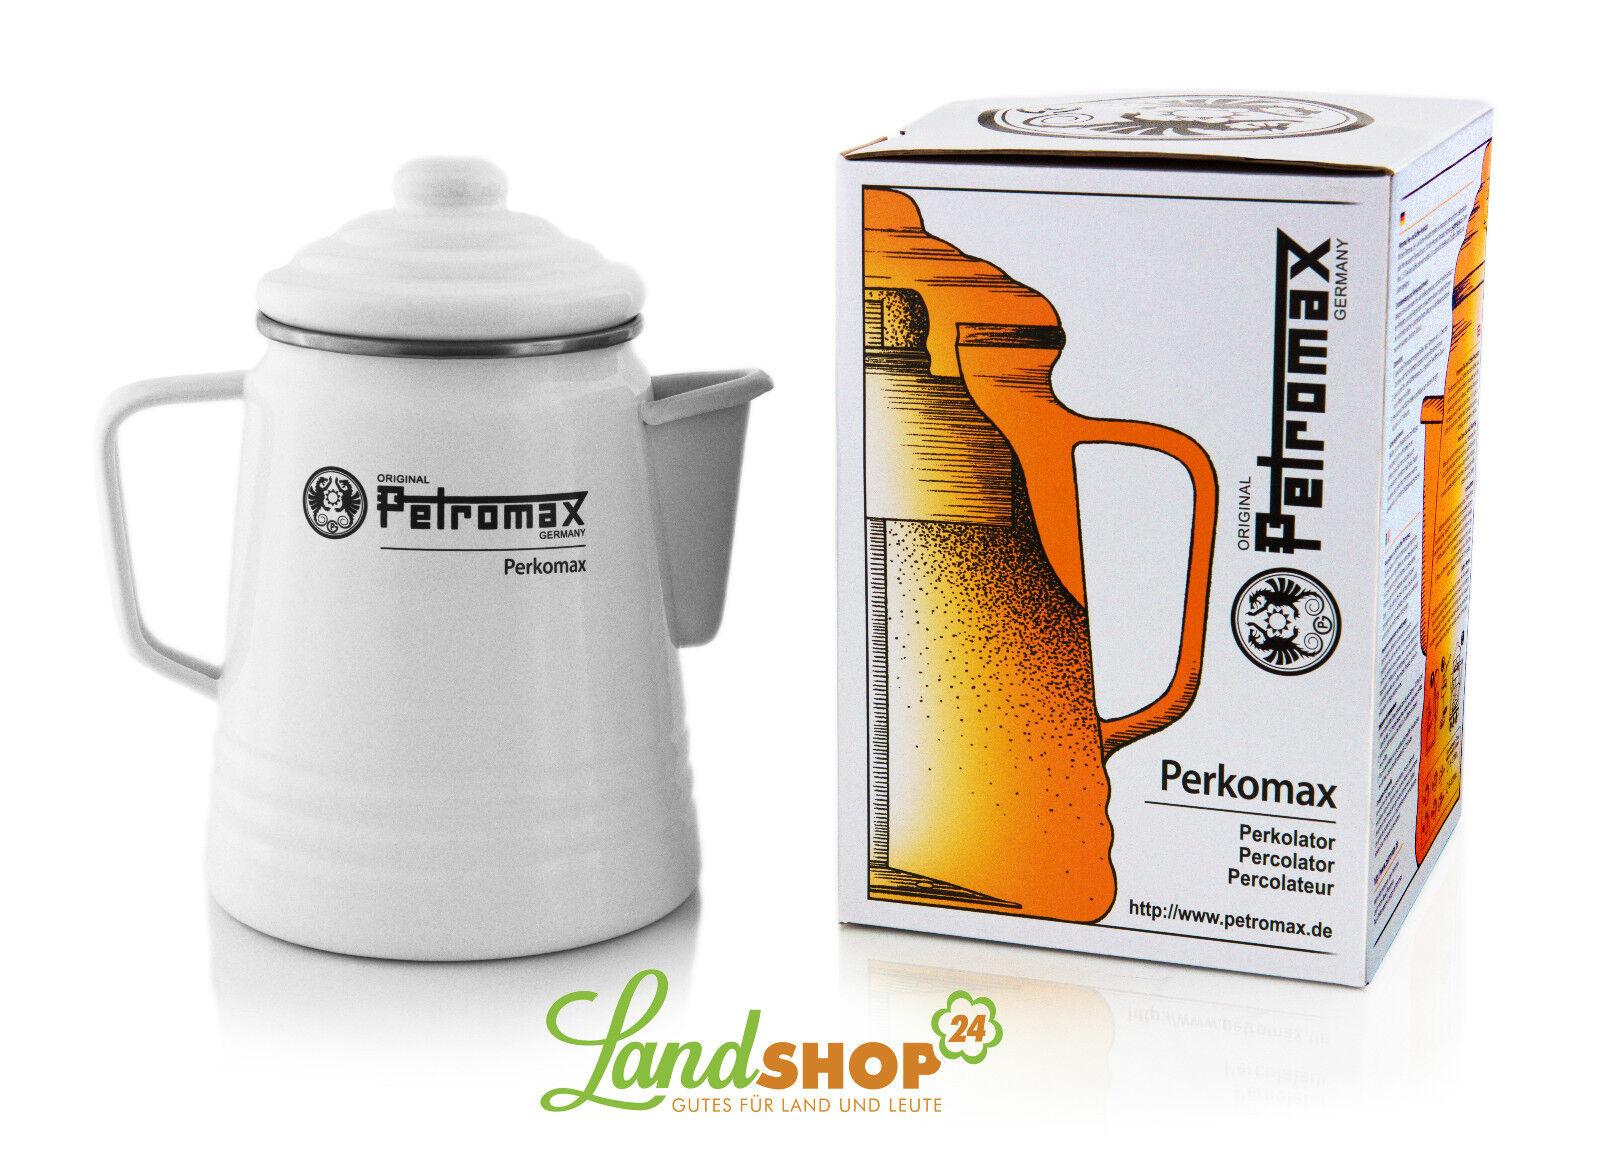 Petromax Perkolator PER-9-W Tee Kaffee Kanne Emaille Weiß Camping Outdoor Zelten